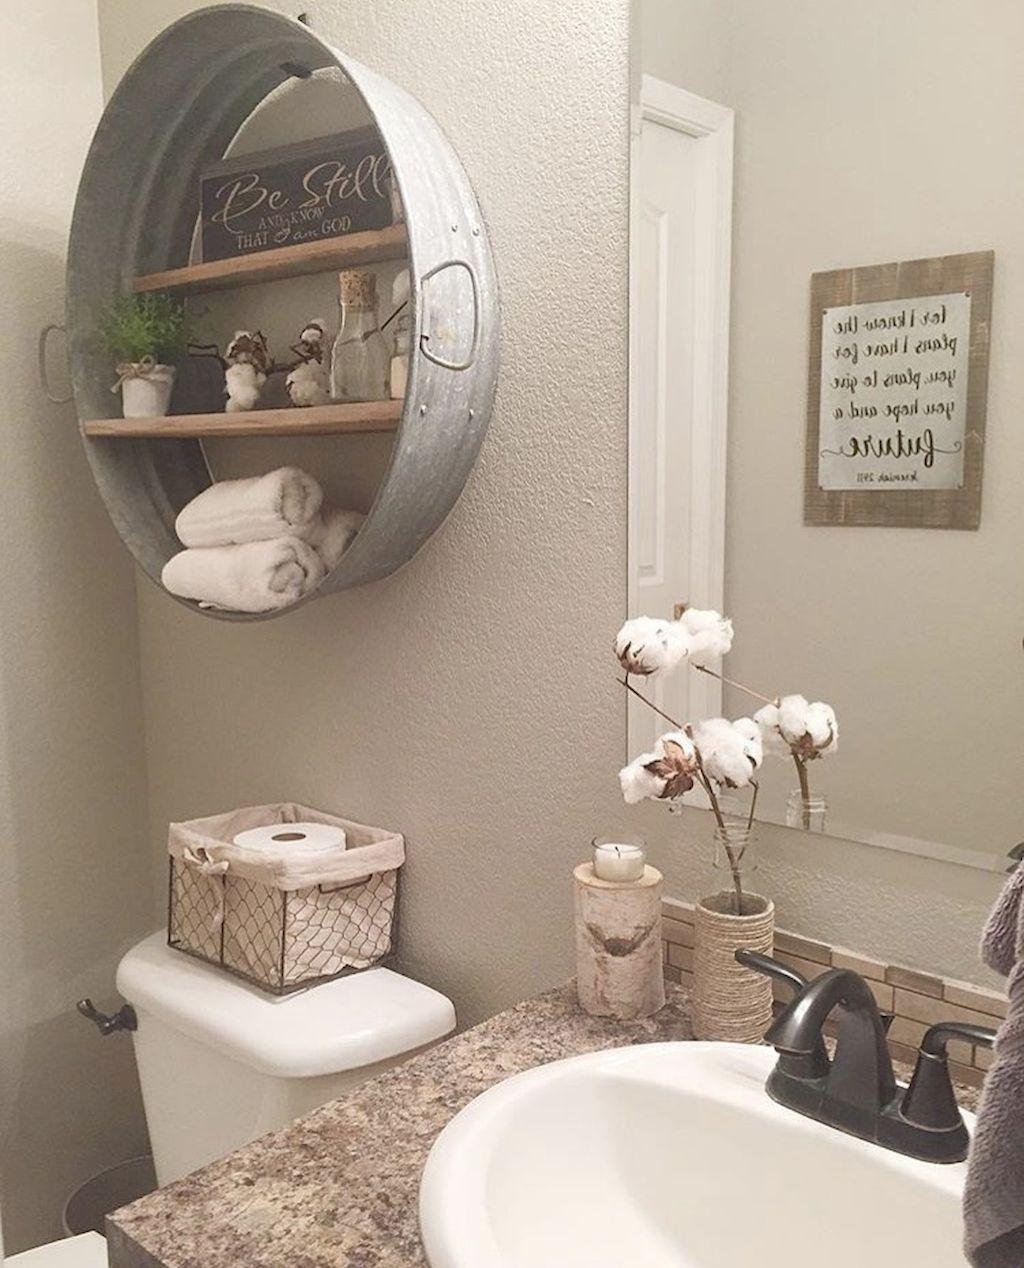 Awesome 125 Rustic Farmhouse Bathroom Remodel Ideas Https Moodecor Co 884